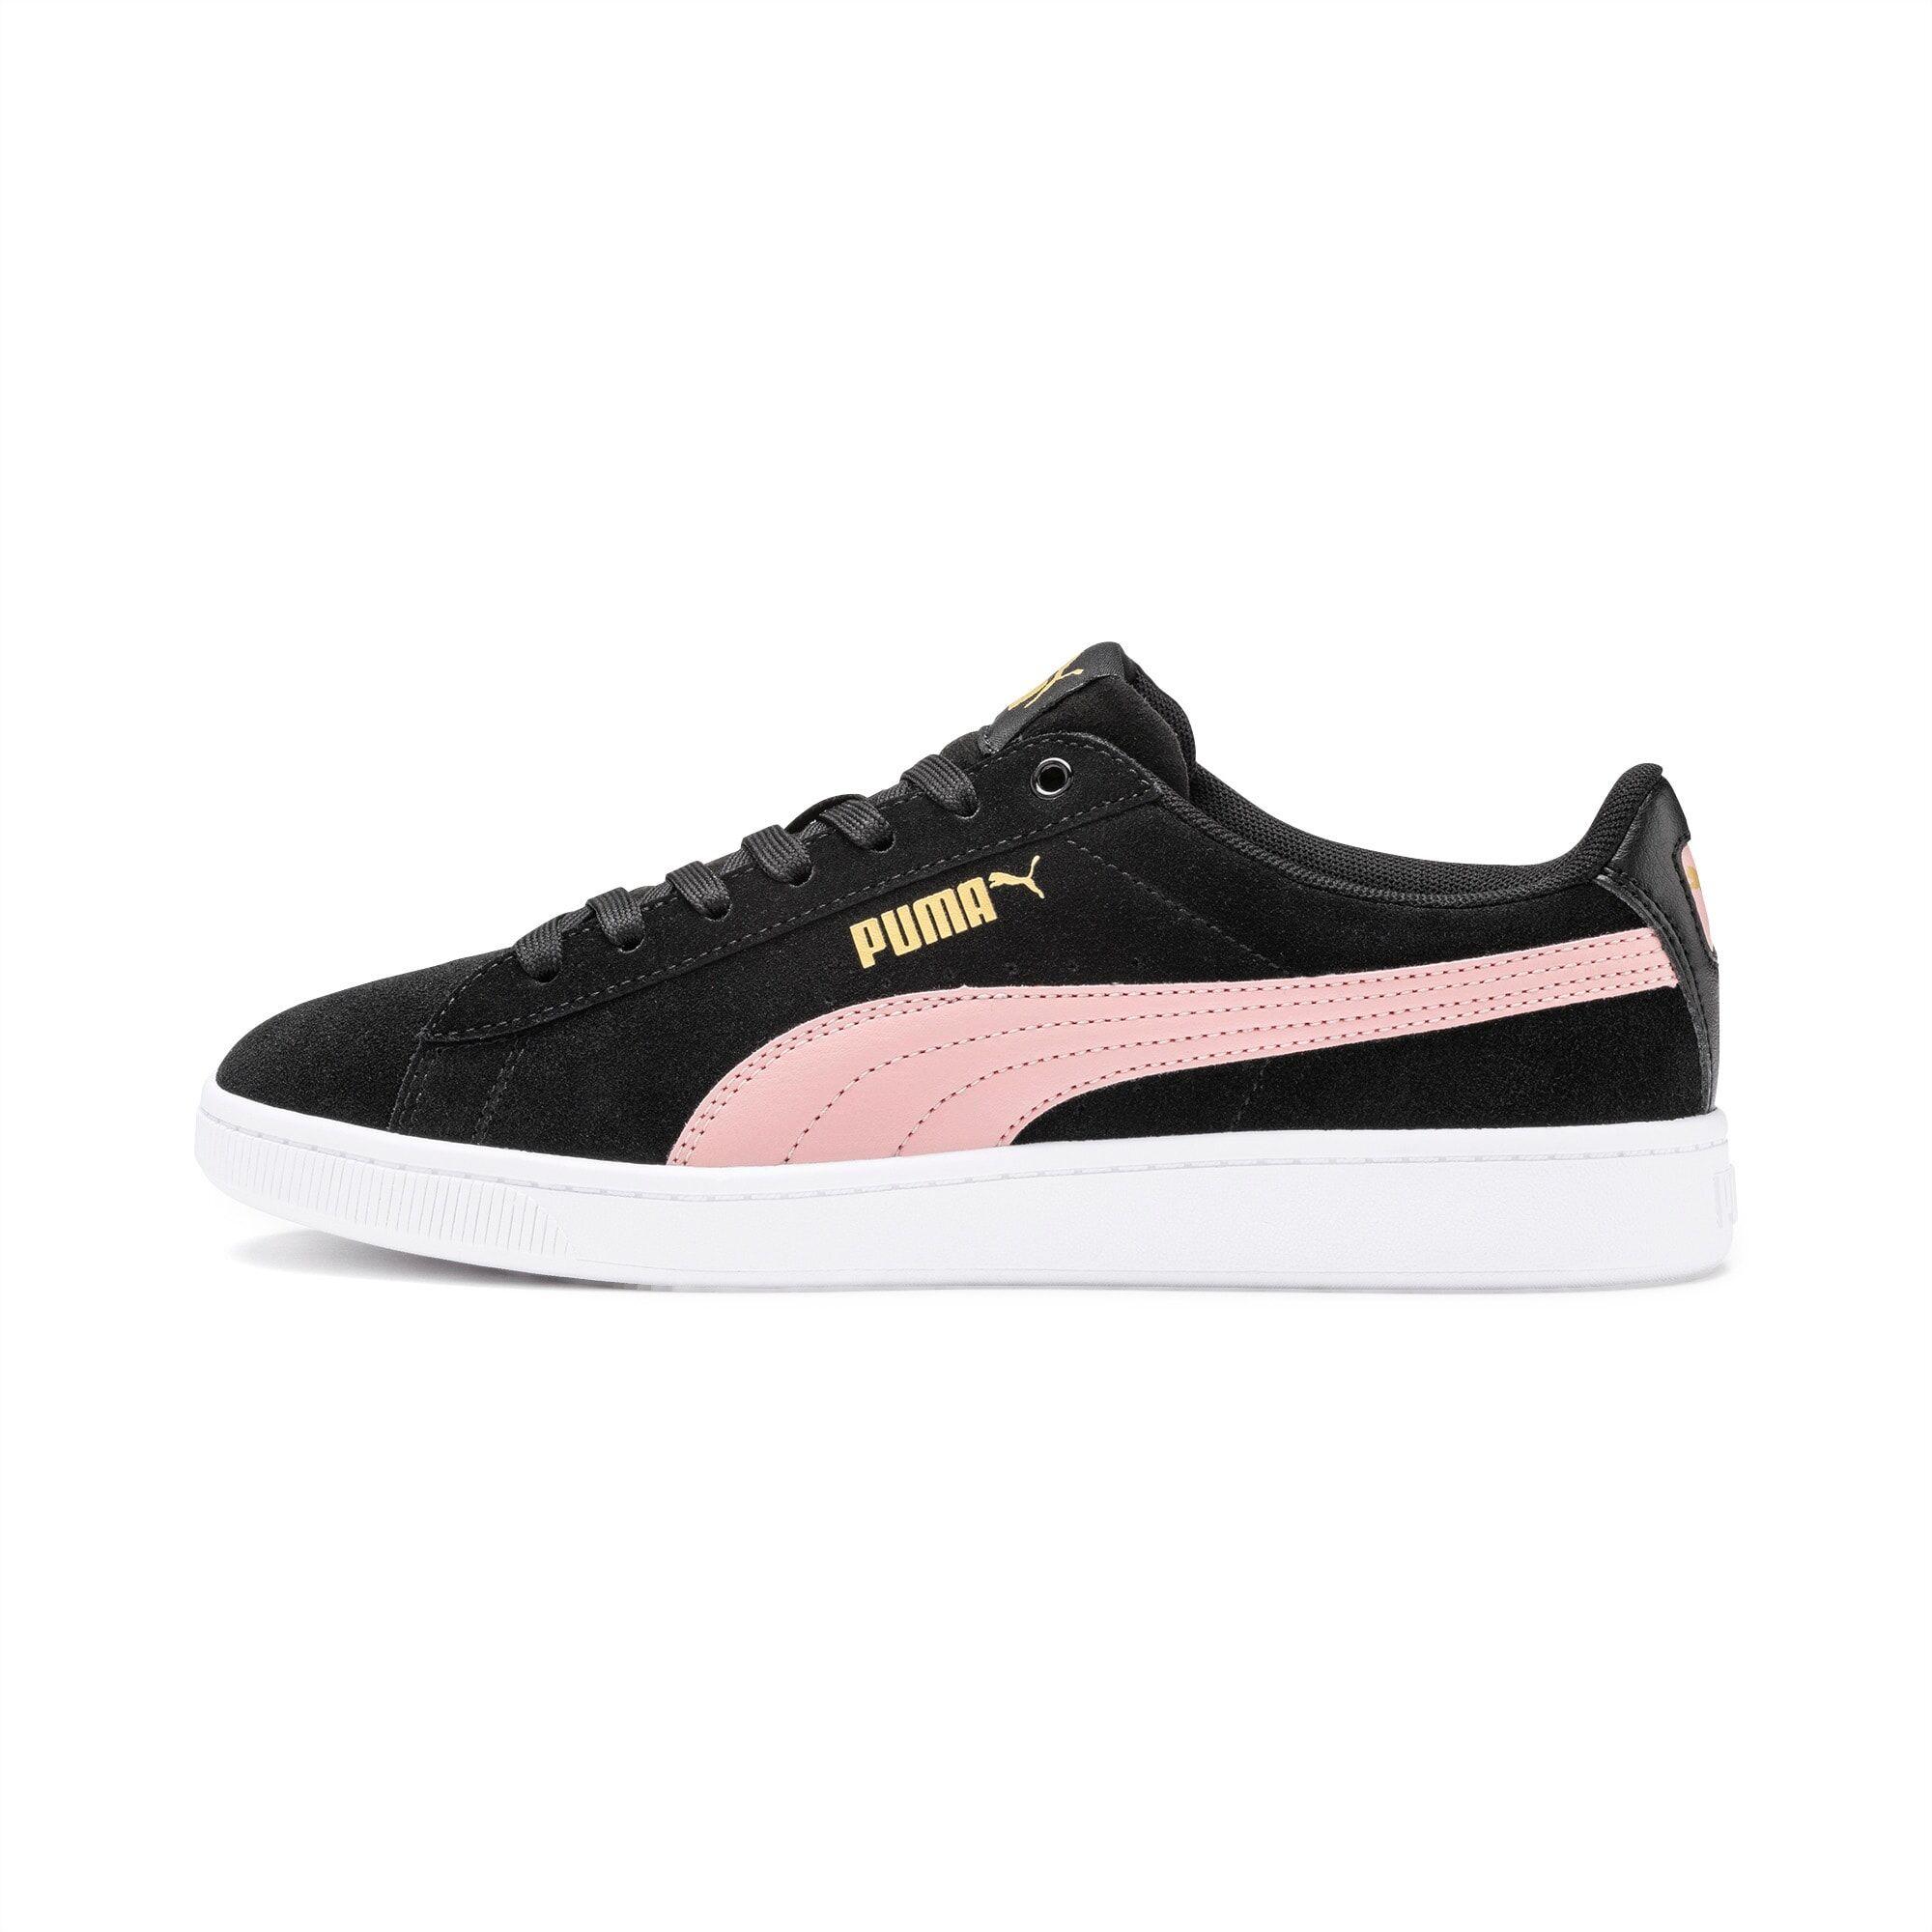 PUMA Chaussure Basket Vikky v2 pour Femme, Blanc/Rose/Noir, Taille 39, Chaussures